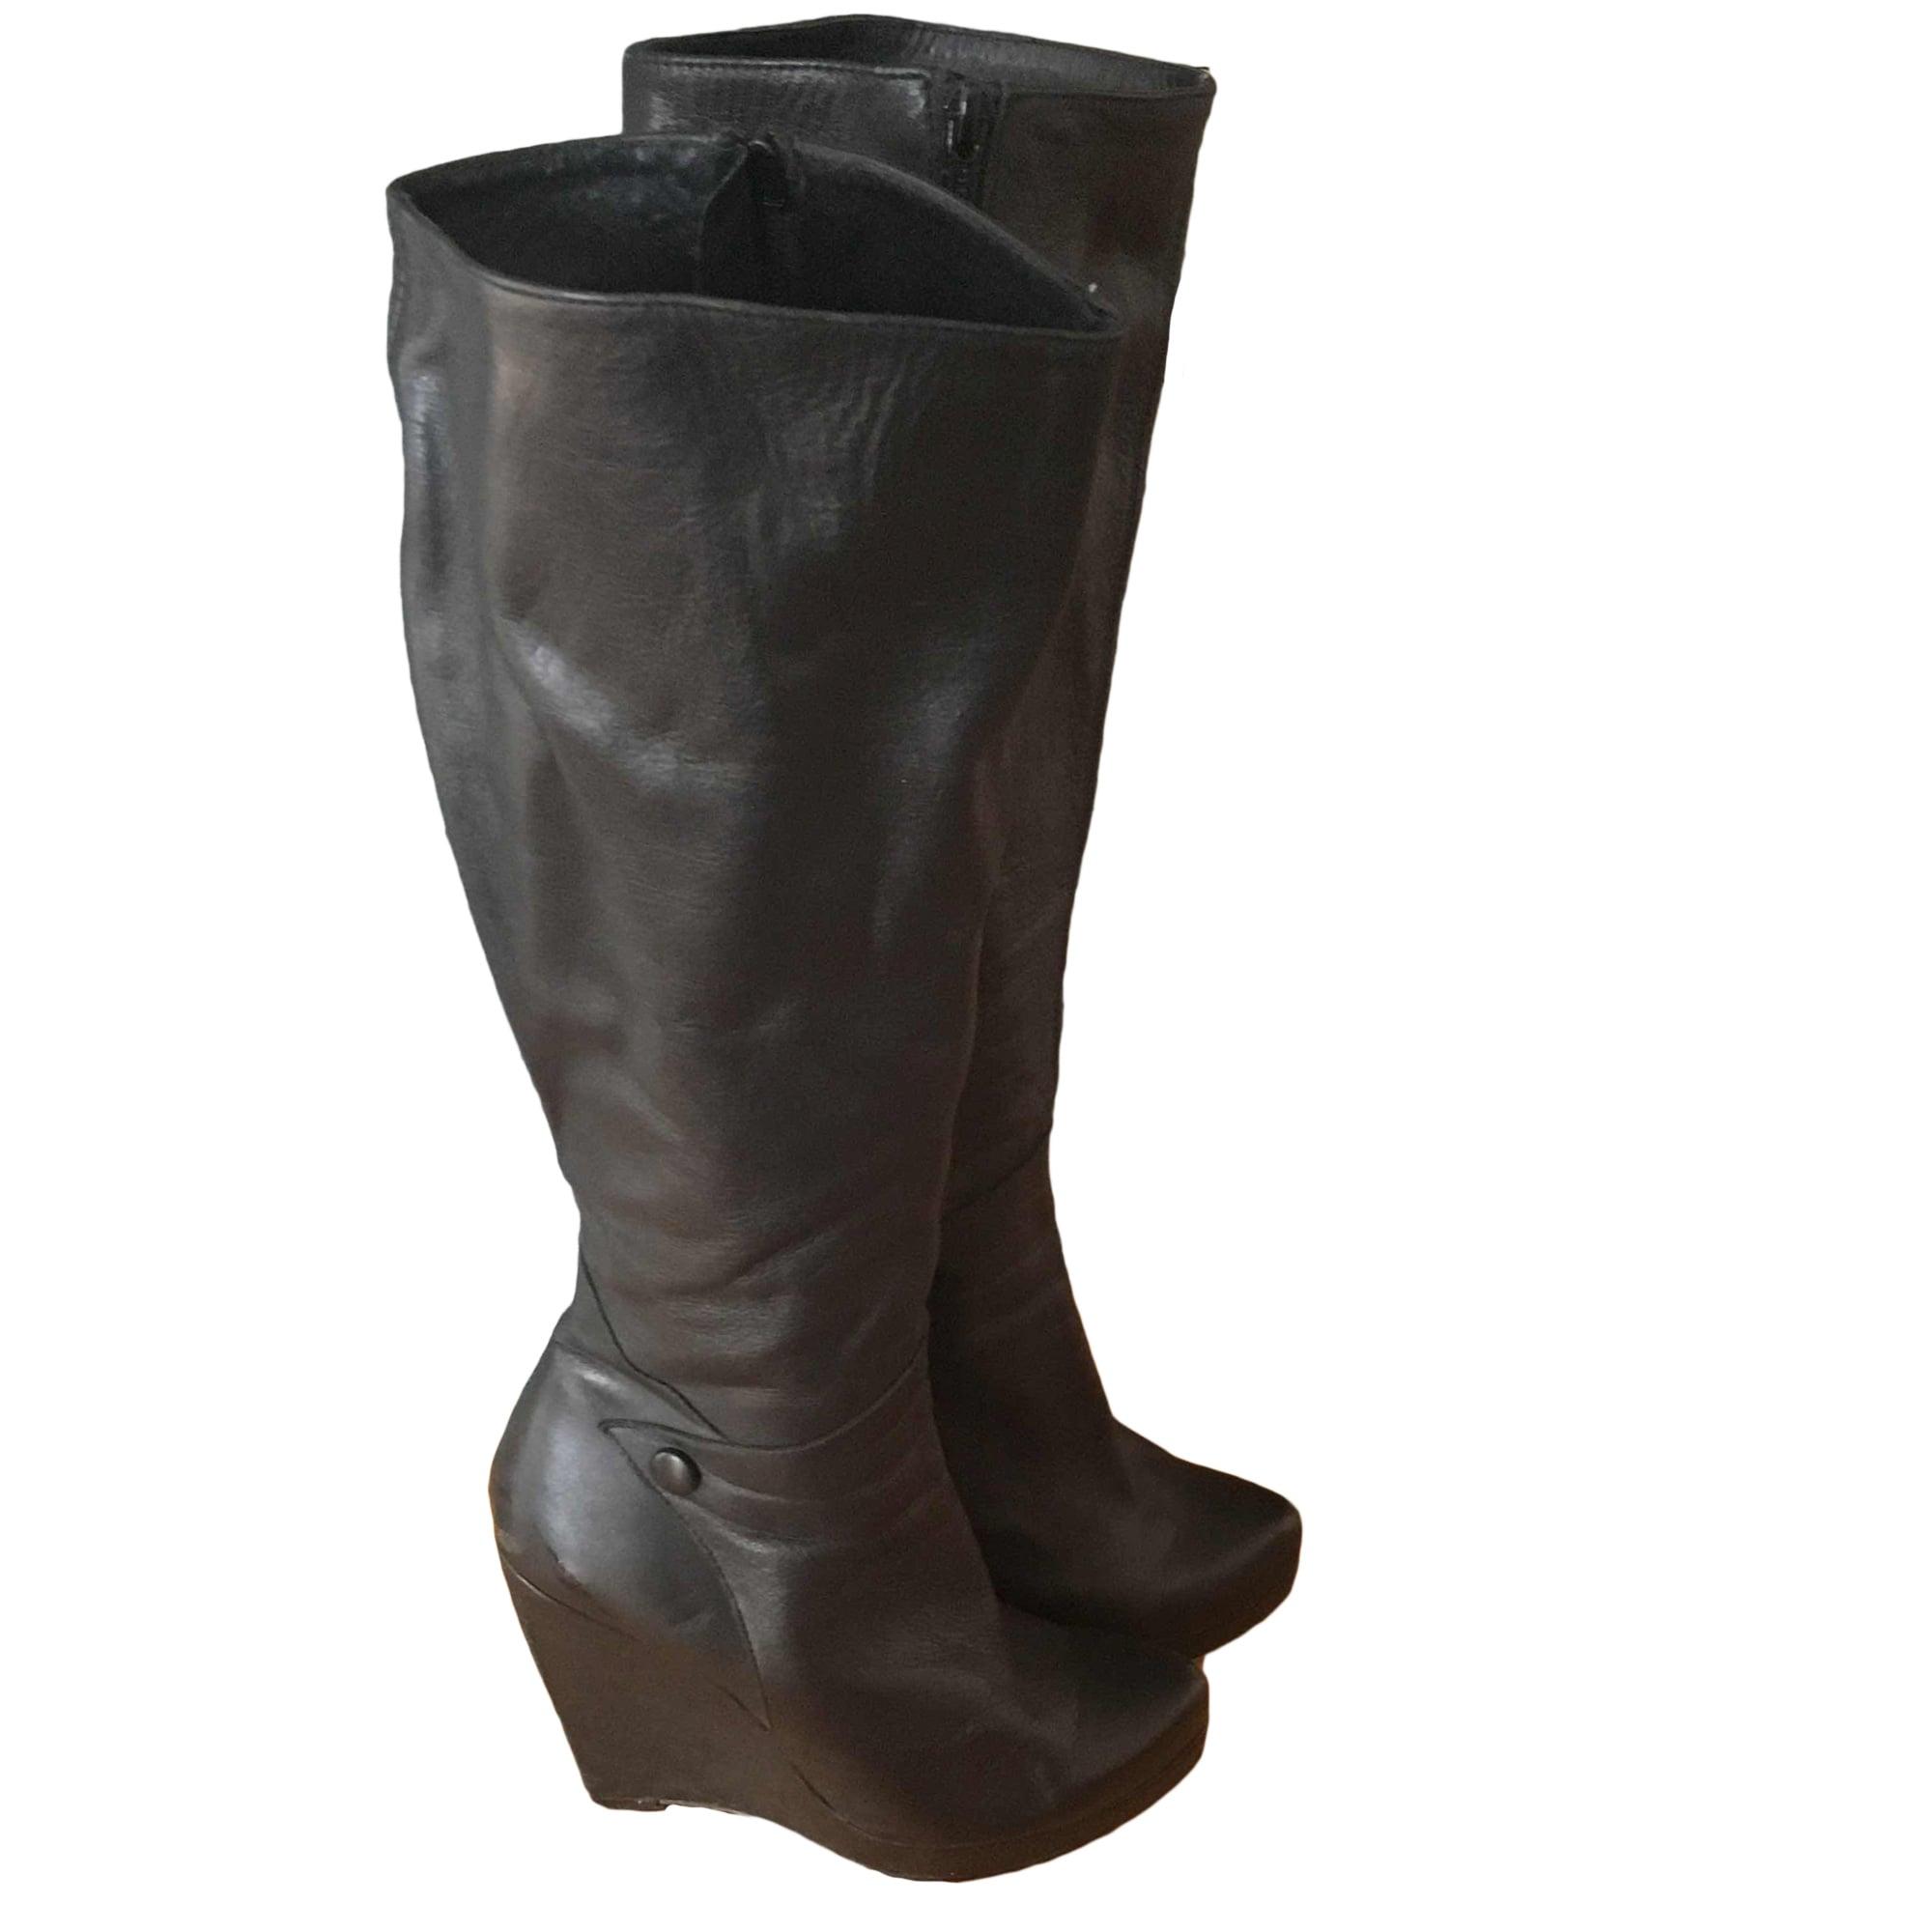 bottes compensées marque buffalo en cuir